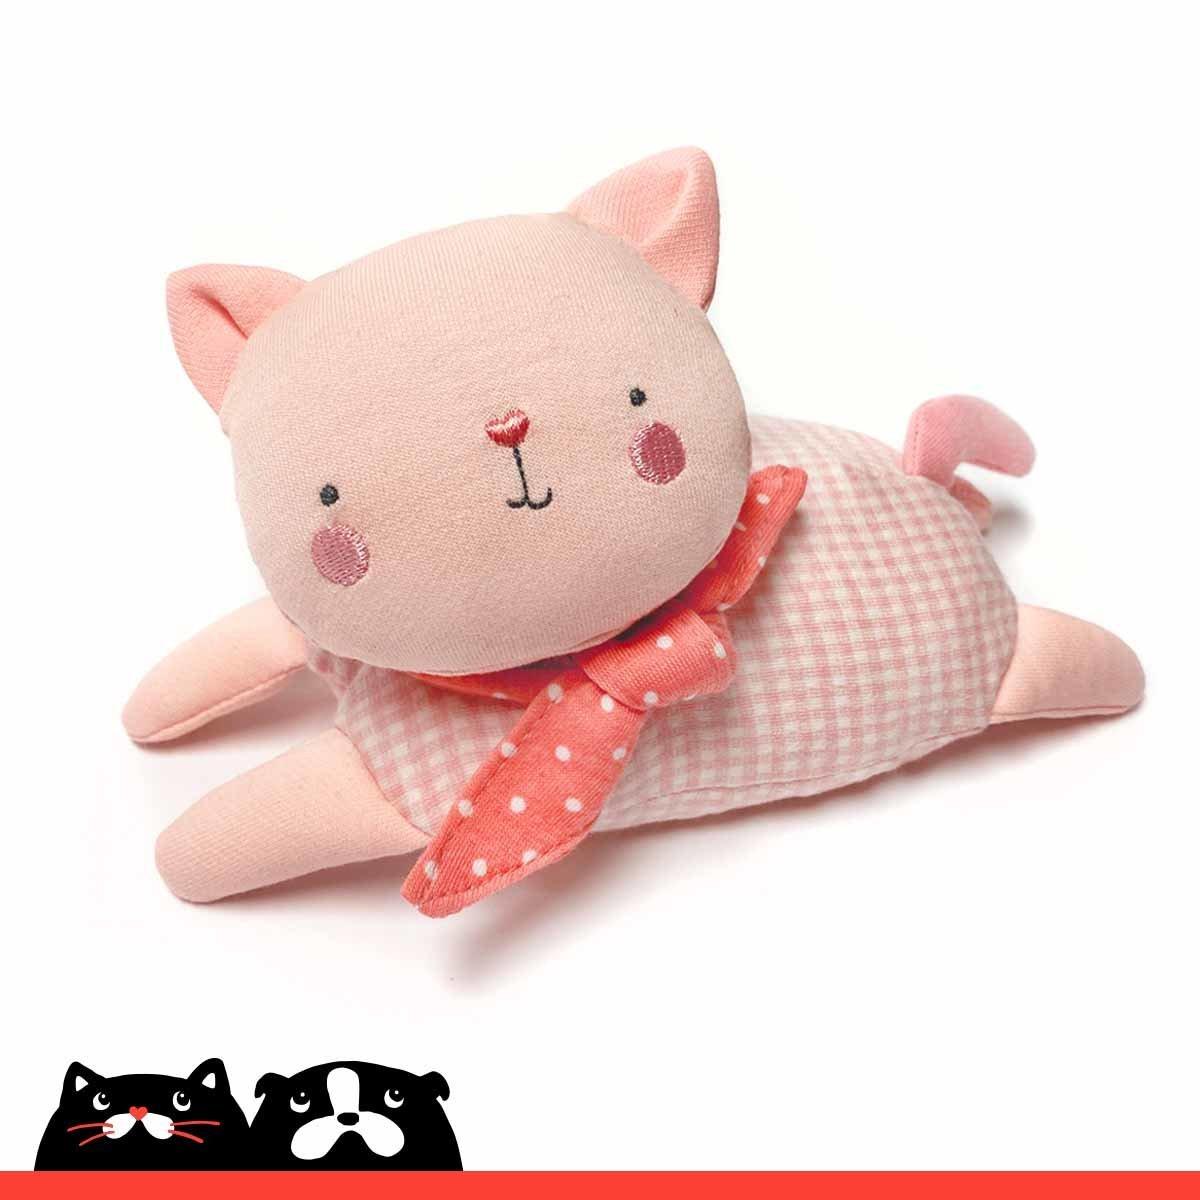 Small Pink Bean Bag Kitten Soft Toy